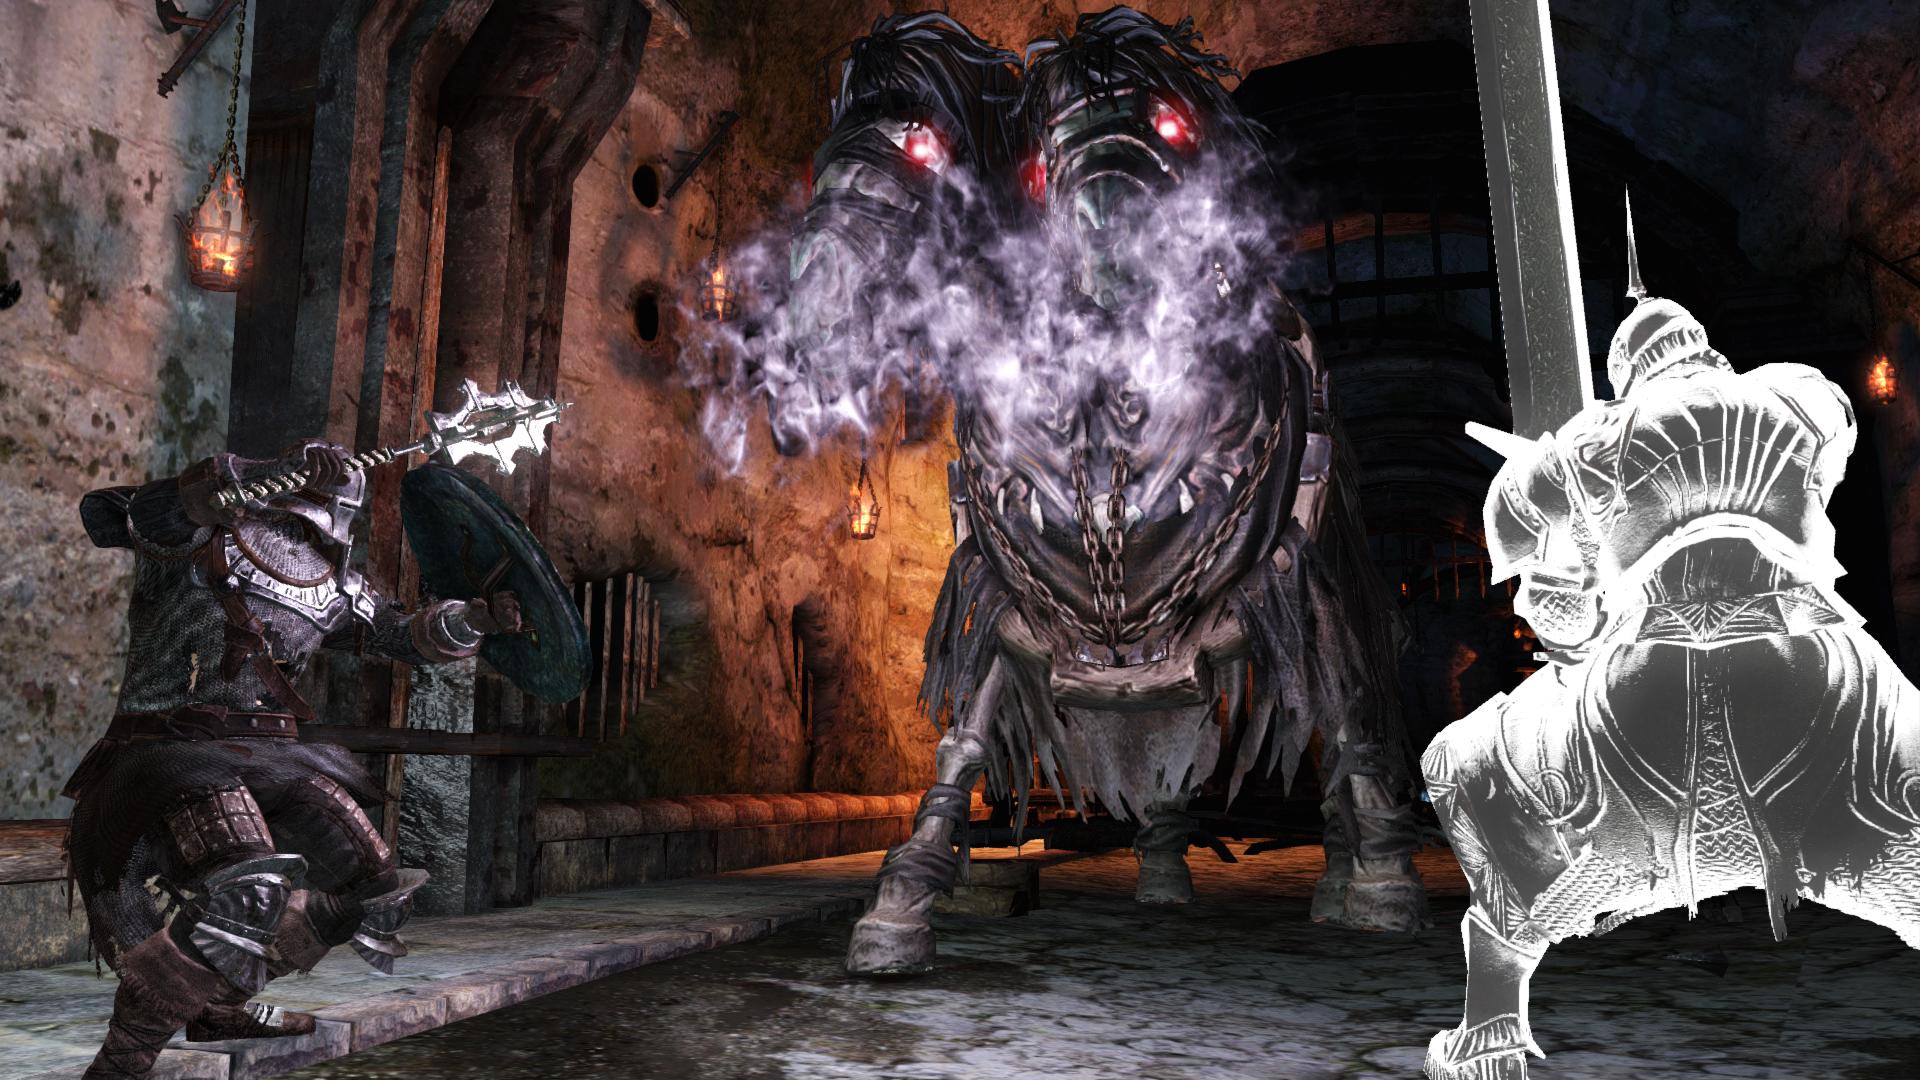 Obrazem: Temné dungeony, kostlivci a monstra z Dark Souls 2: Scholar of the First Sin 107565